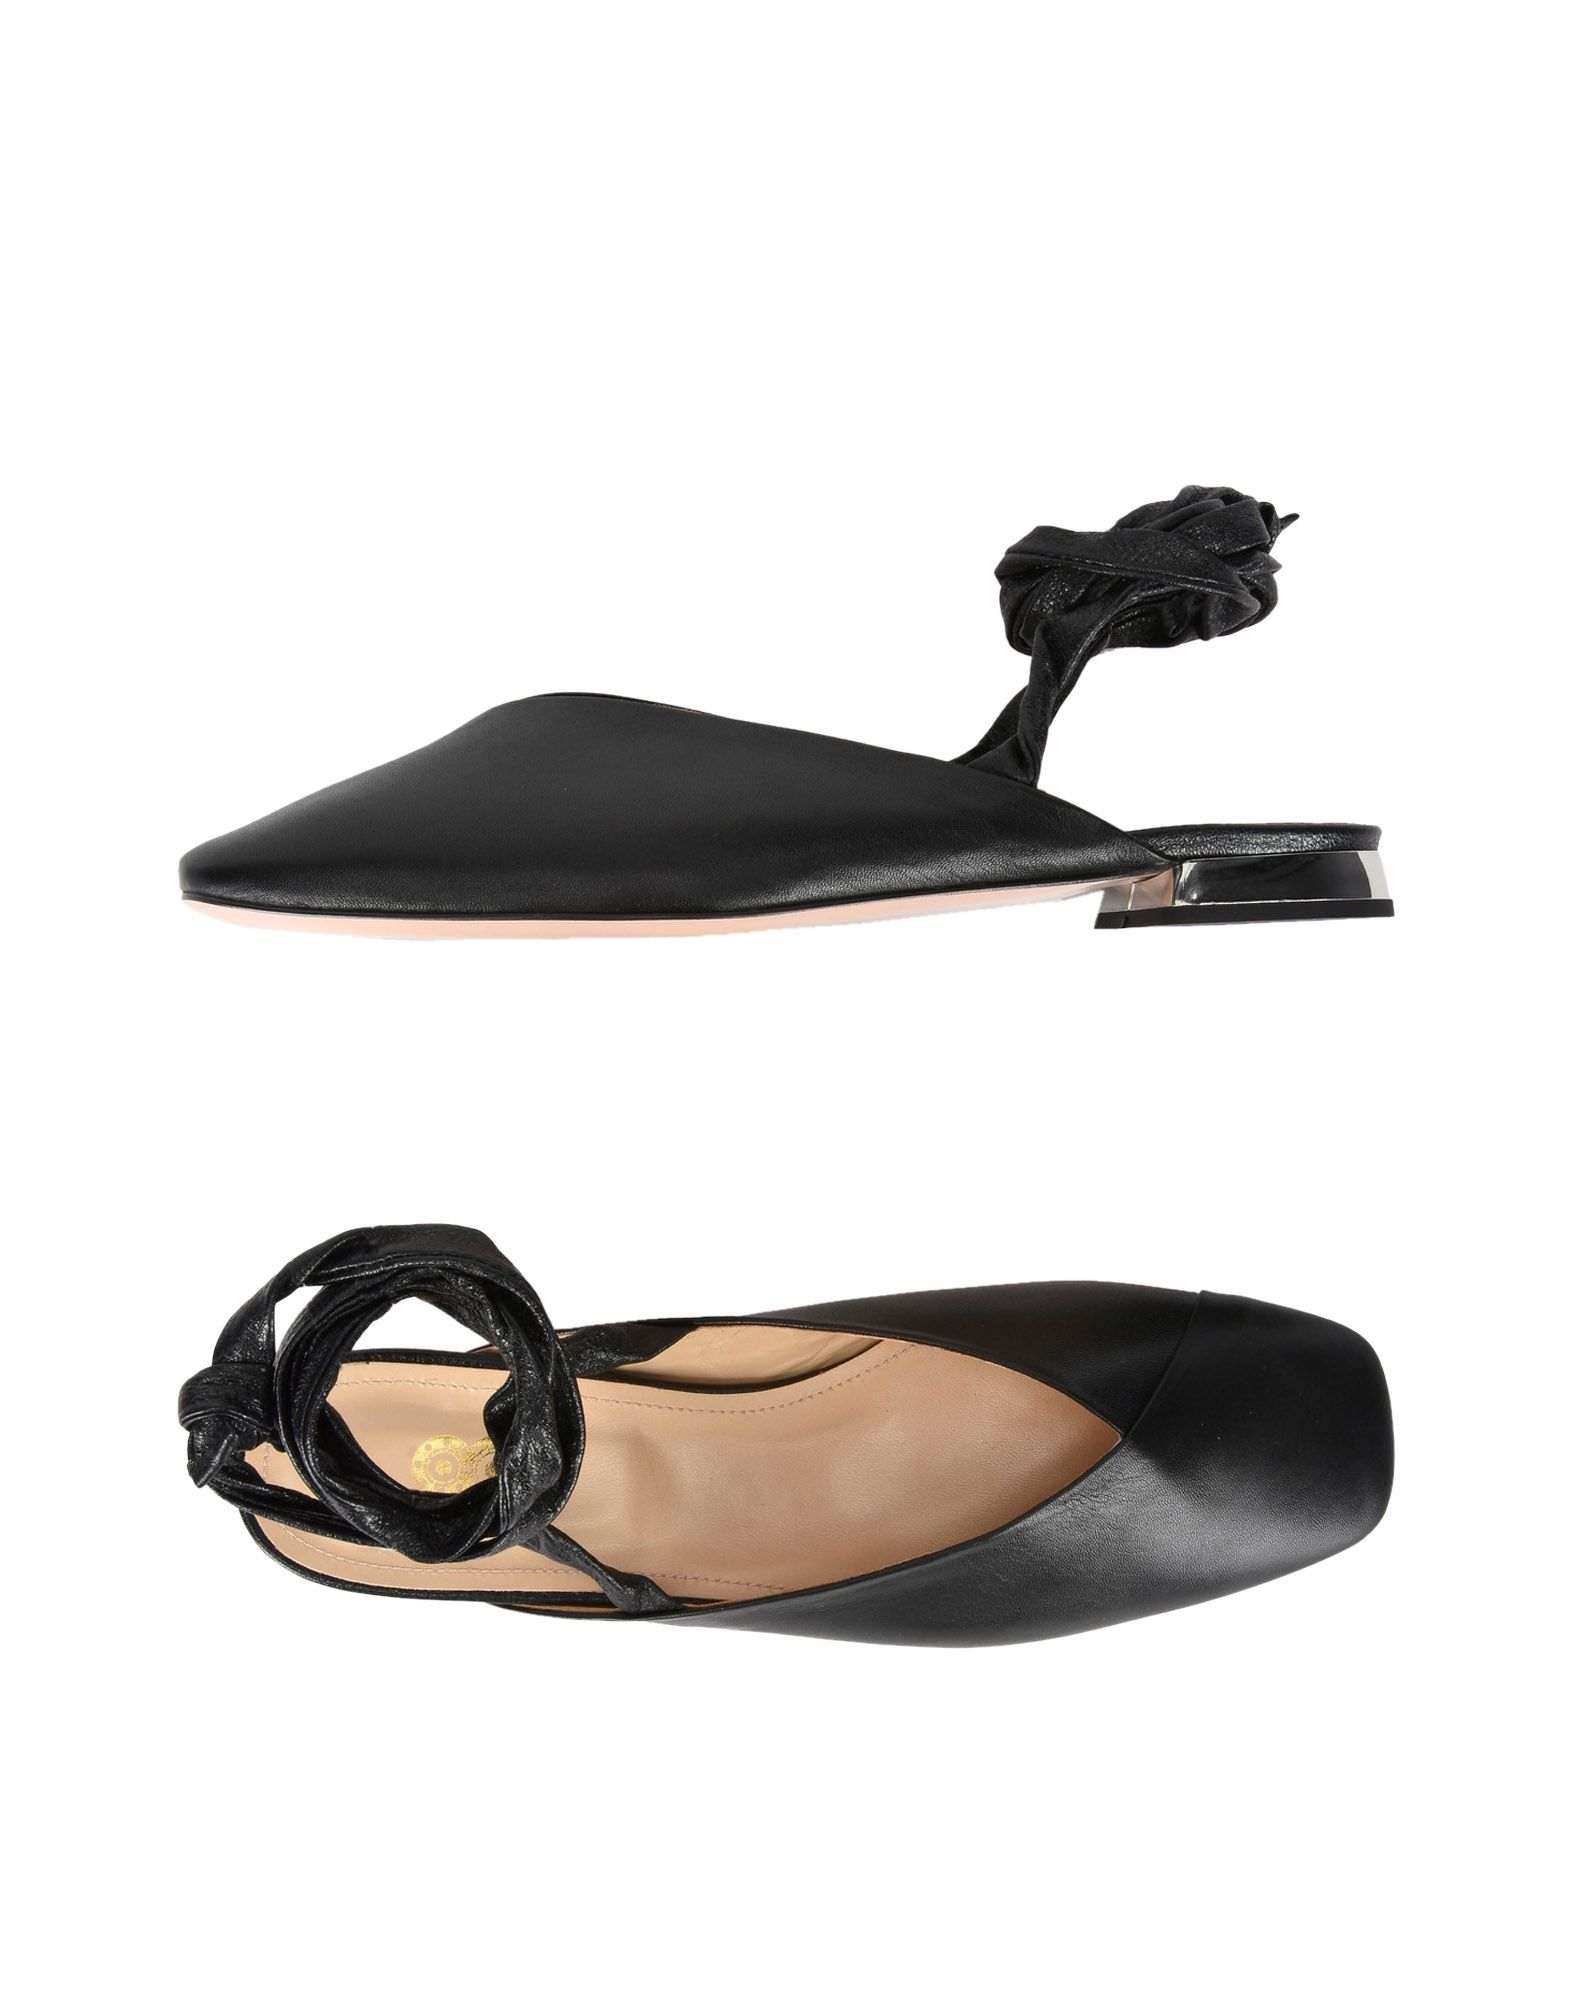 8 Ballerinas Damen  11458374DU Gute Qualität beliebte Schuhe